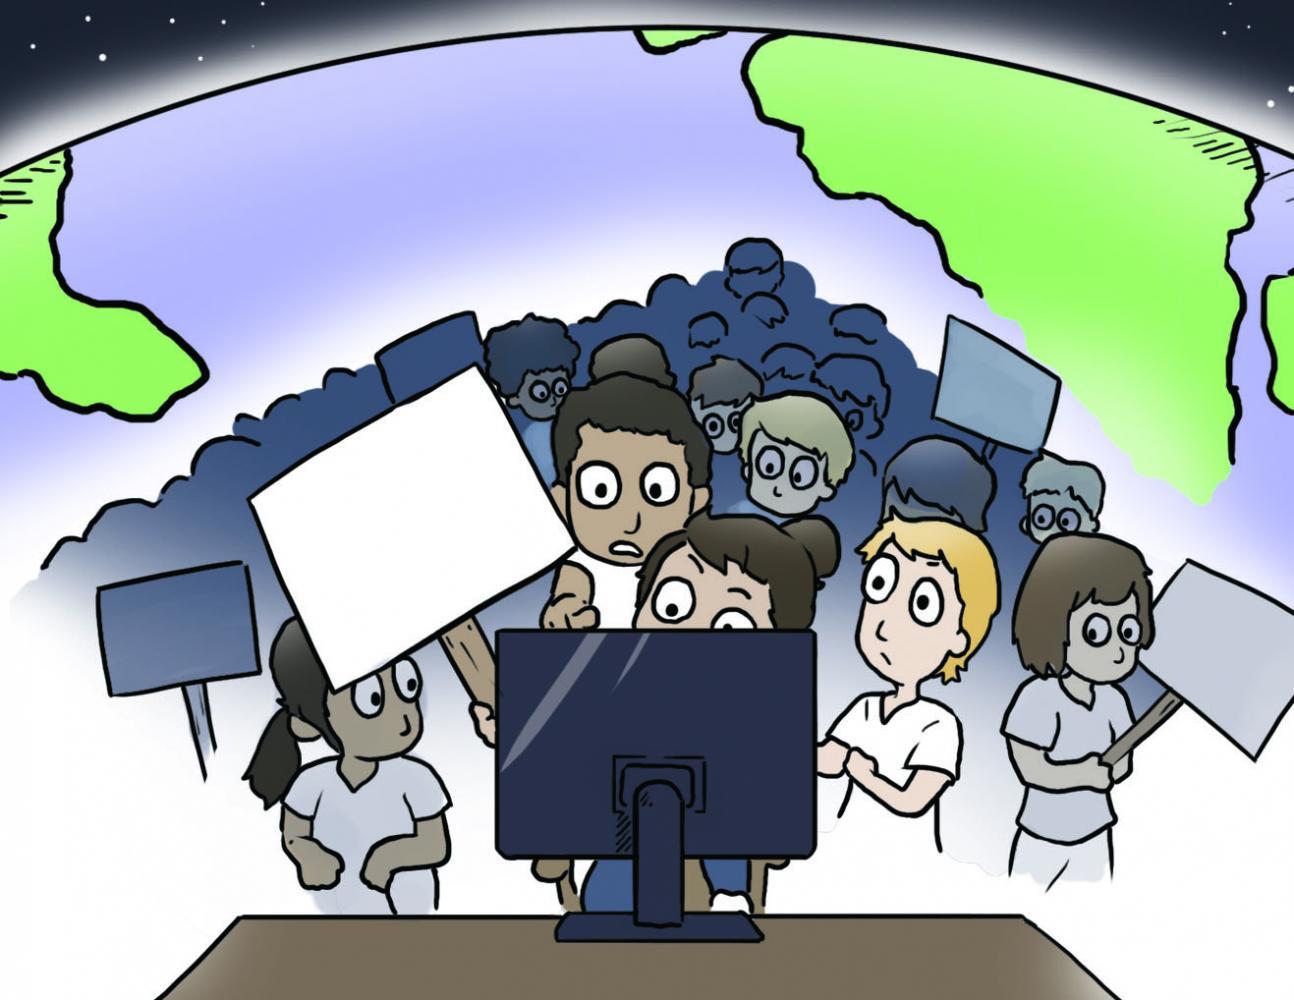 Cartoon by Christopher Perez